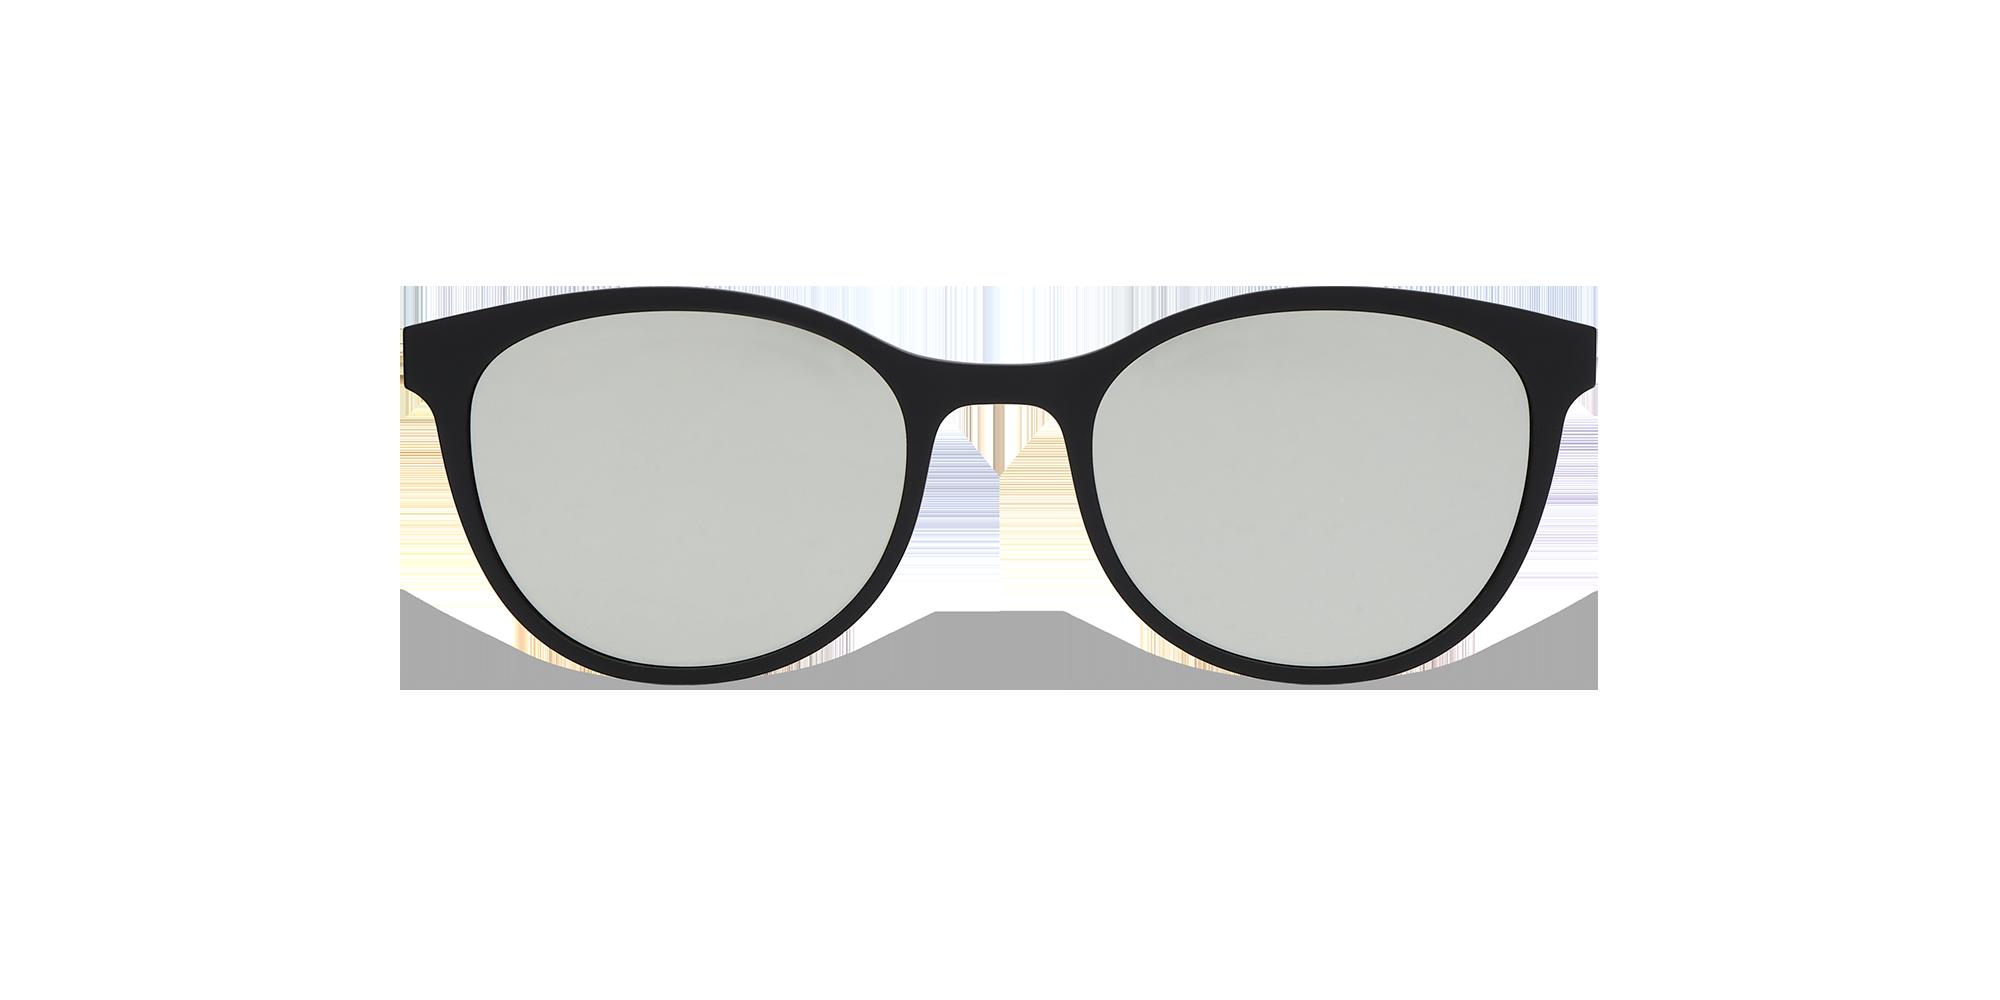 afflelou/france/products/smart_clip/clips_glasses/TMK45R3BK014818.png